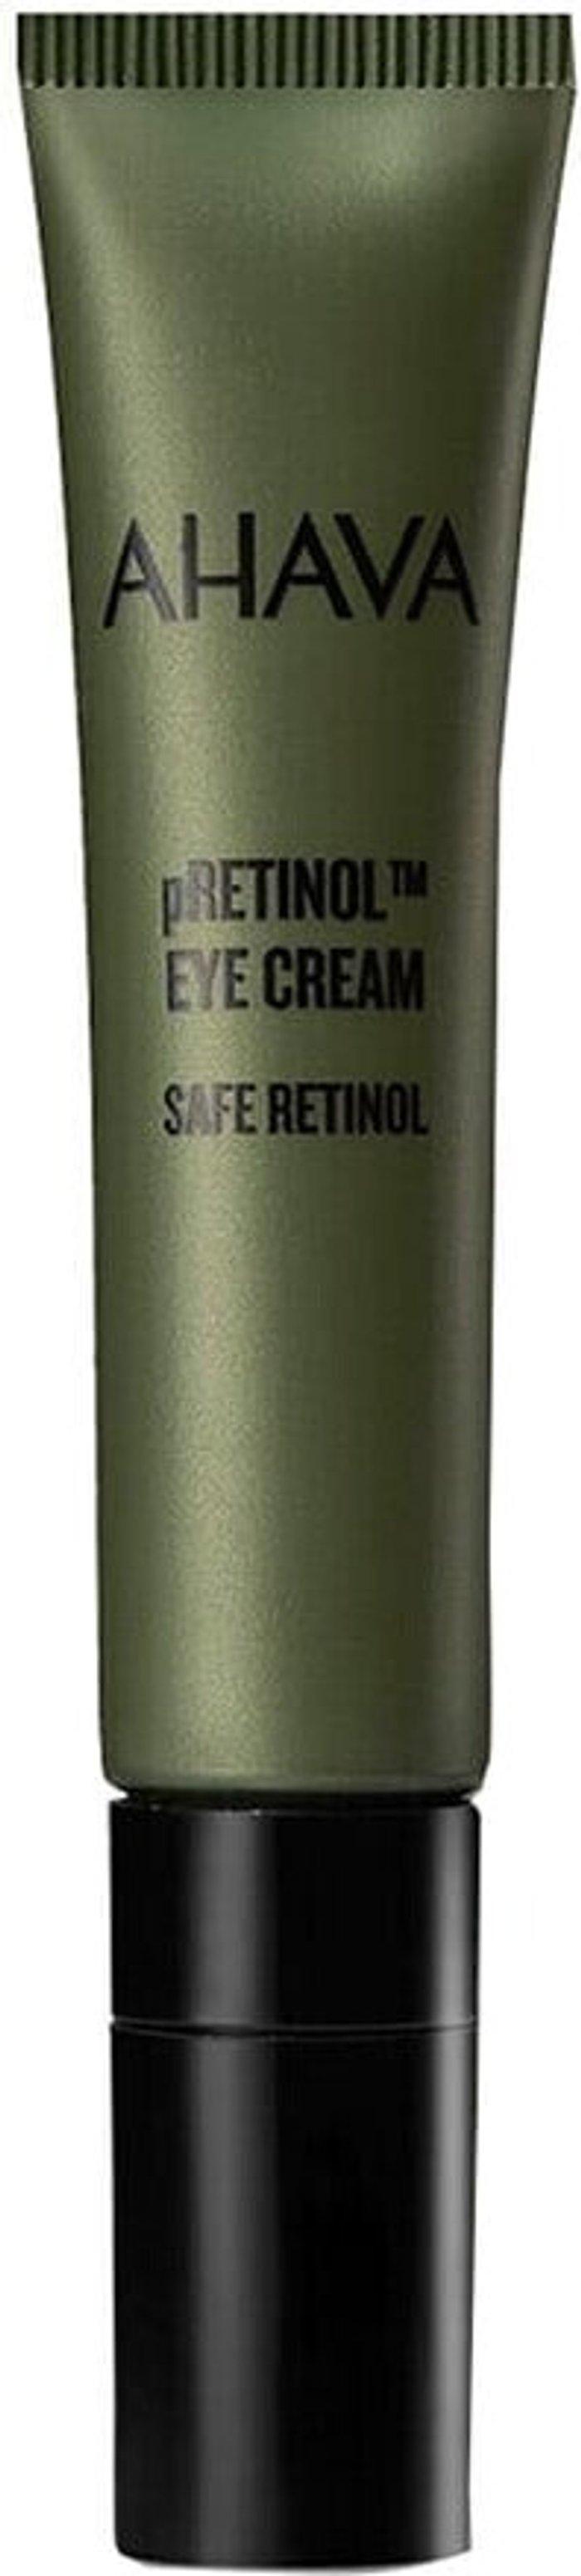 Ahava Ahava pRetin Eye Cream (15ml)